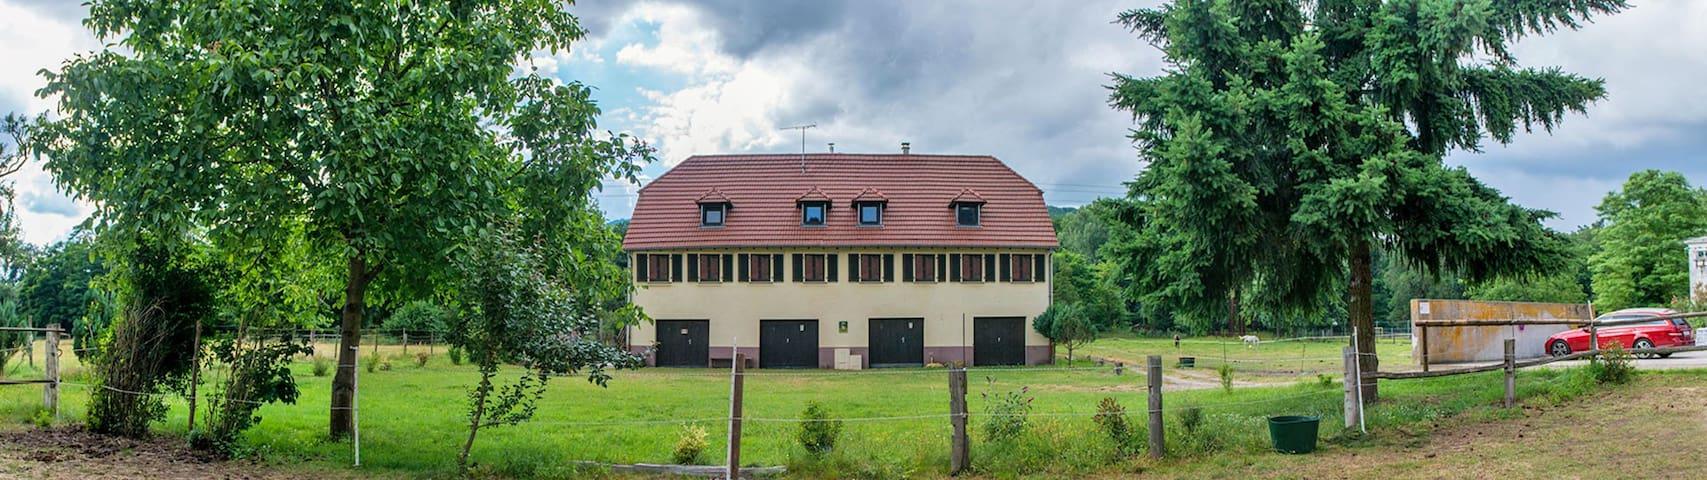 Saphir de La Forge - Wintzenheim